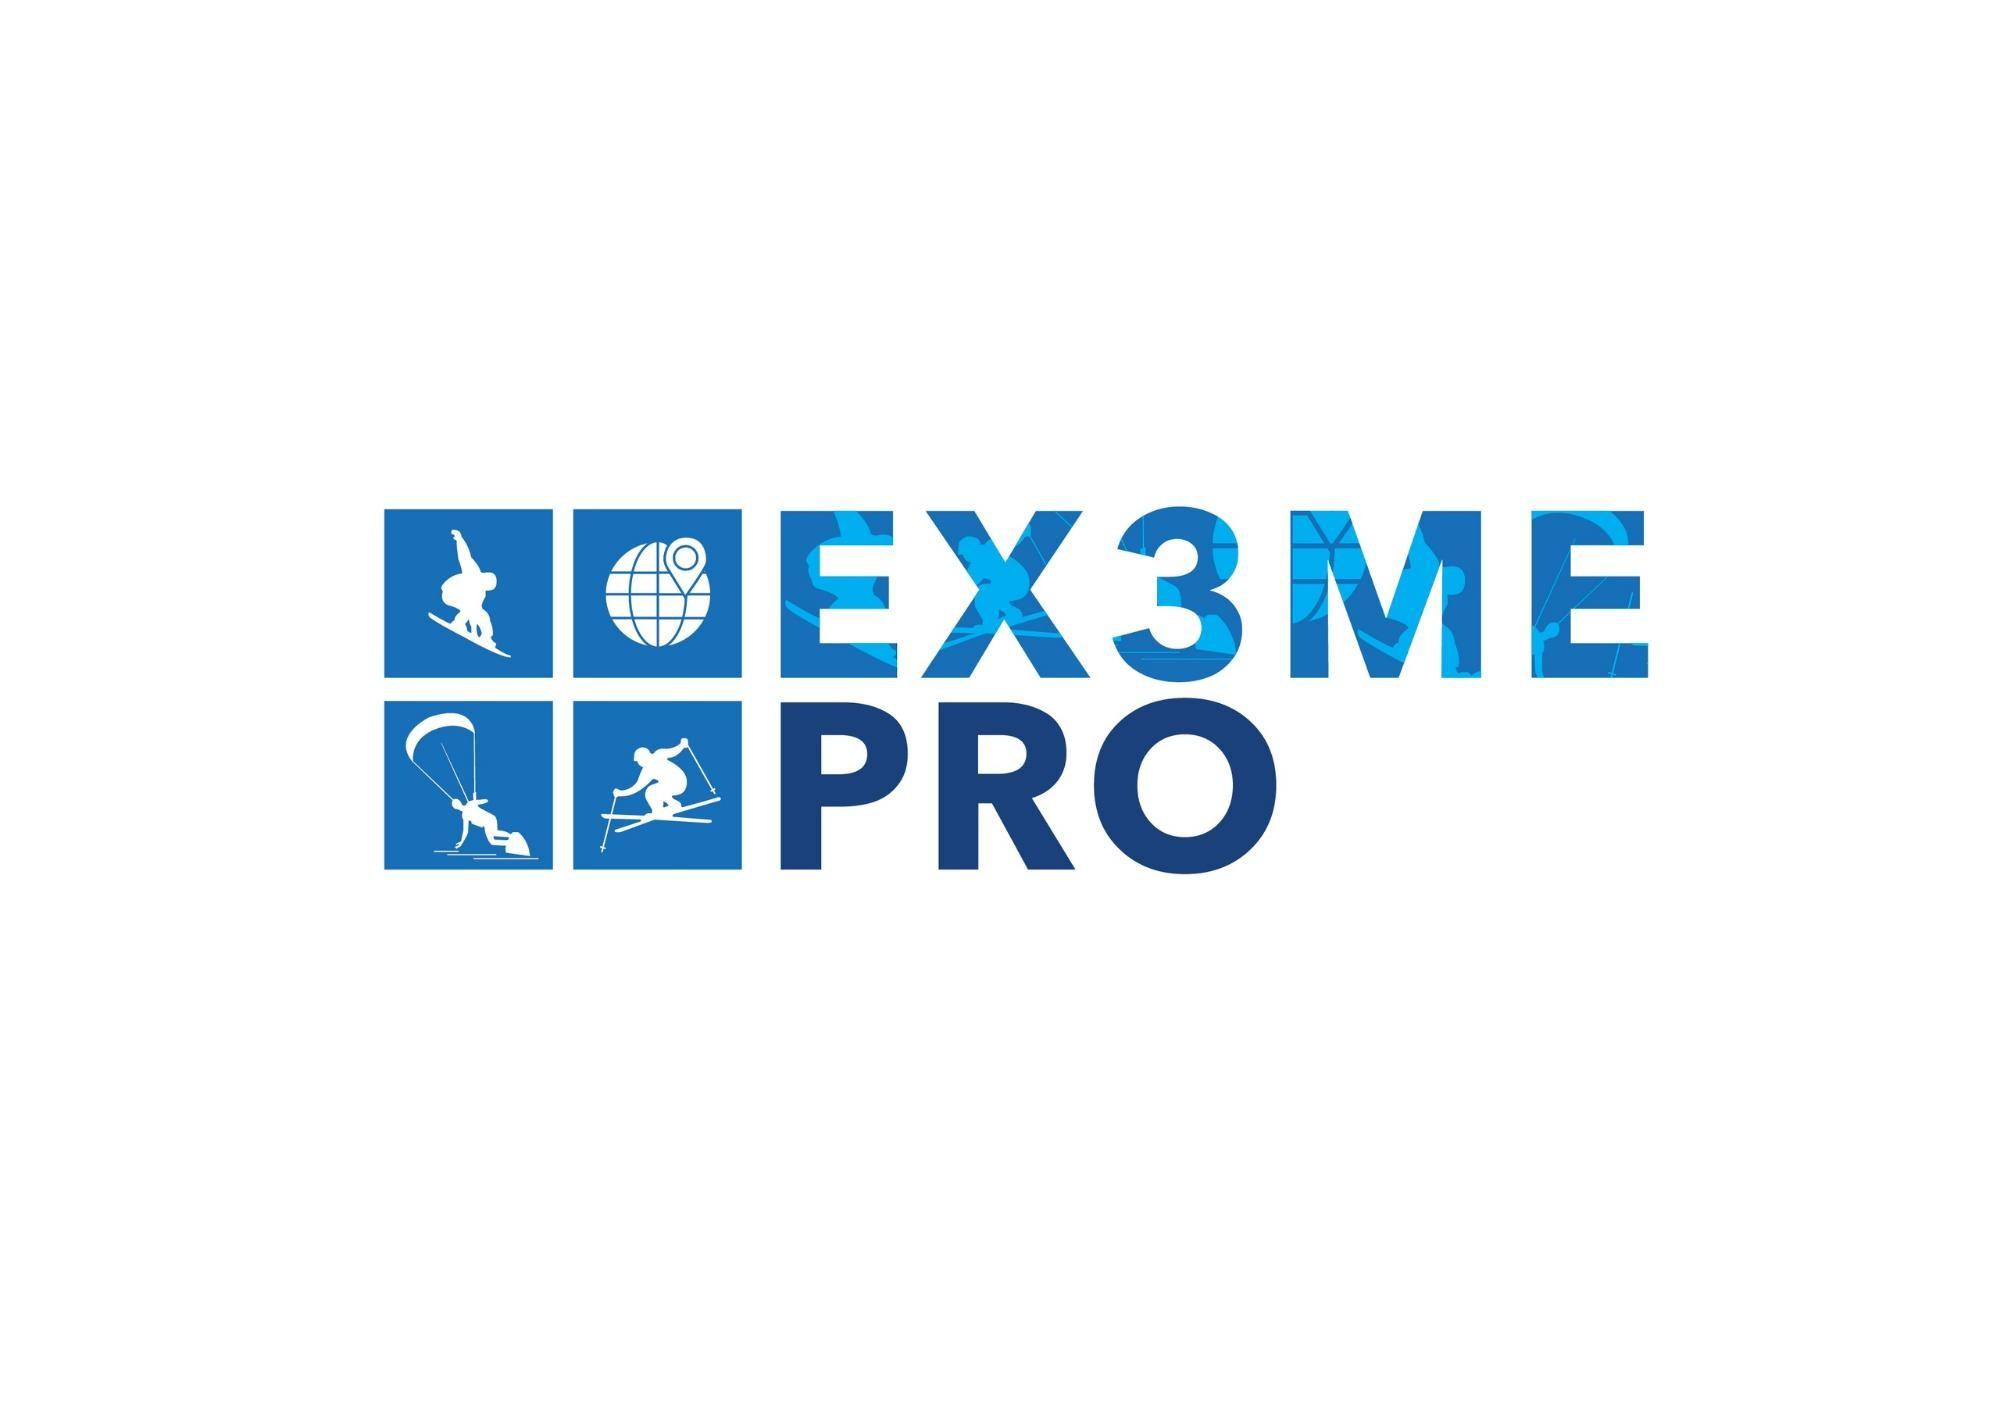 Ex3mePro